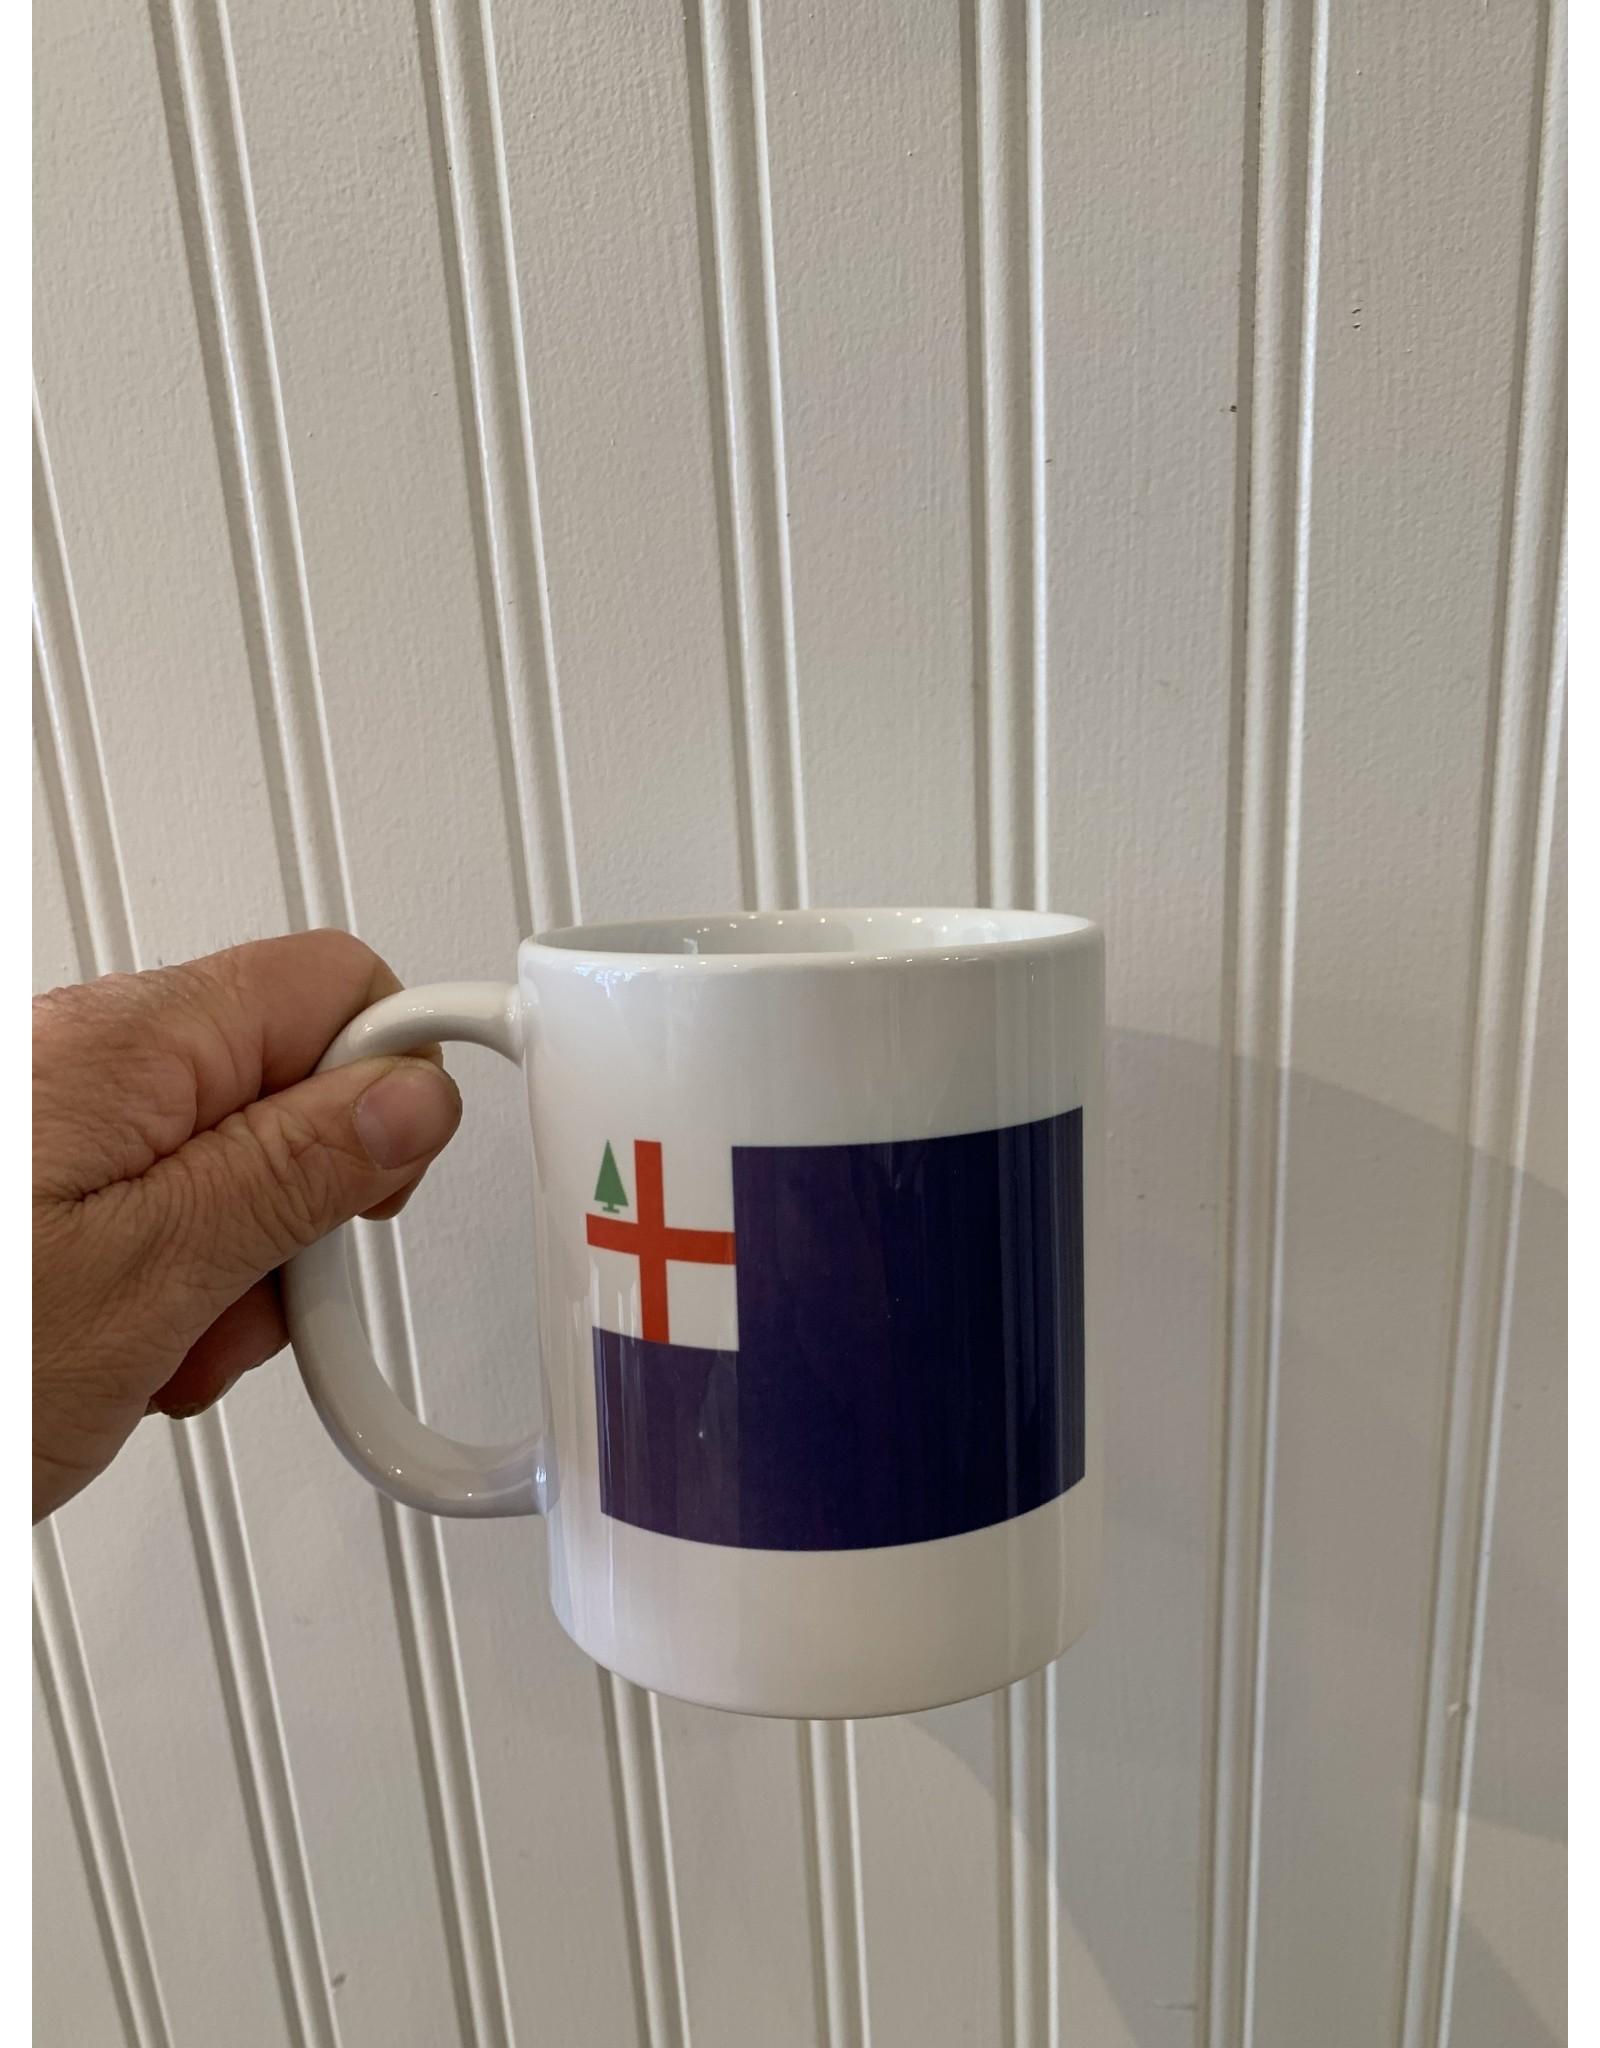 RoseanneBECK Collection 02129 & Bunker Hill Flag Mug